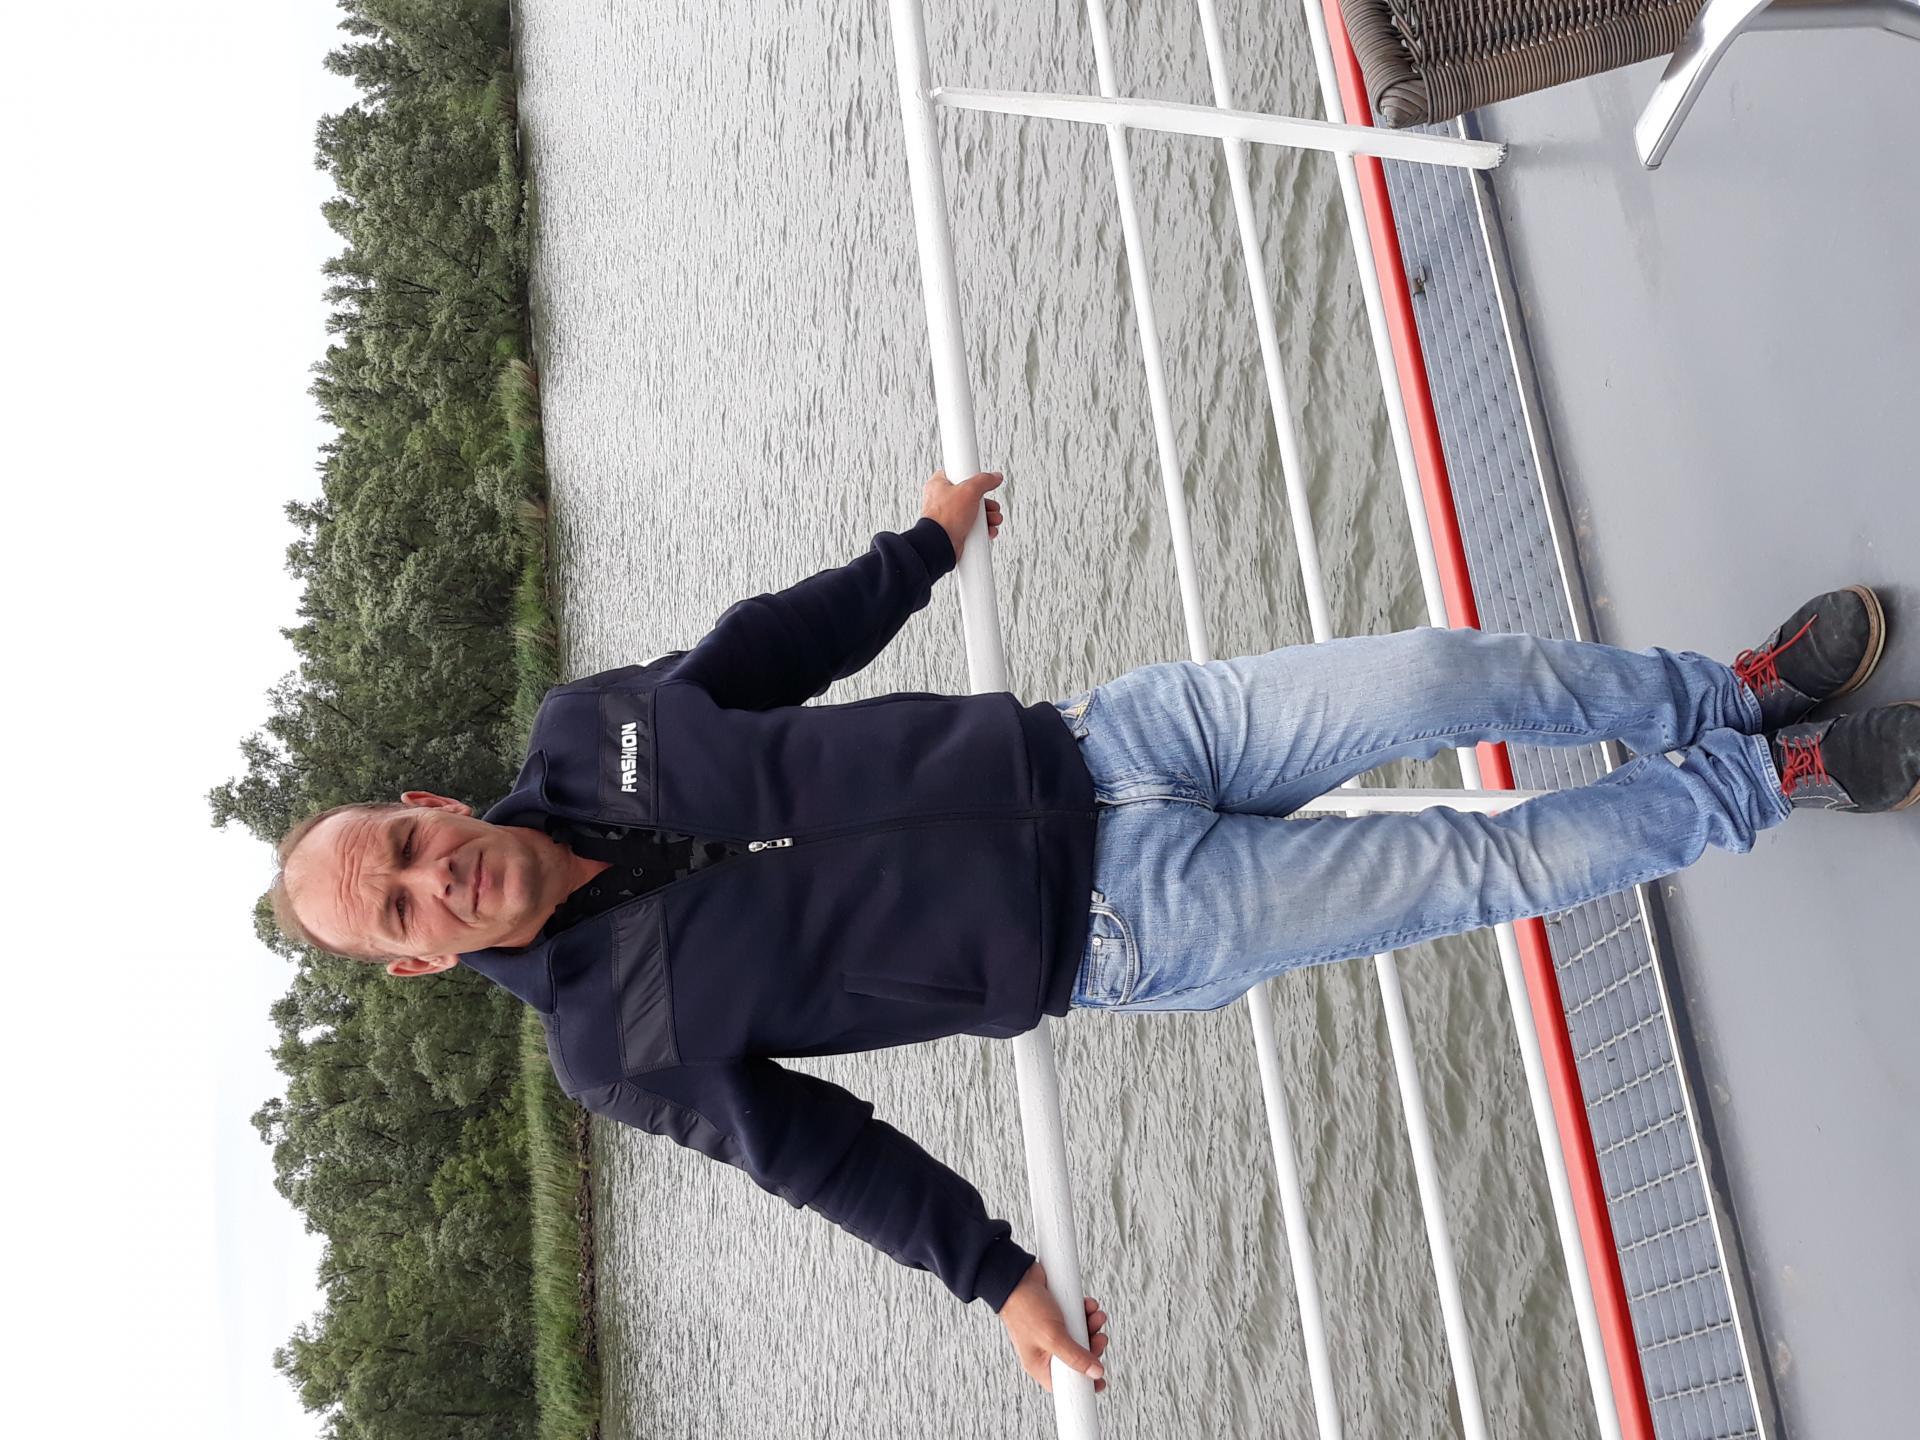 Willemjan13 uit Noord-Brabant,Nederland